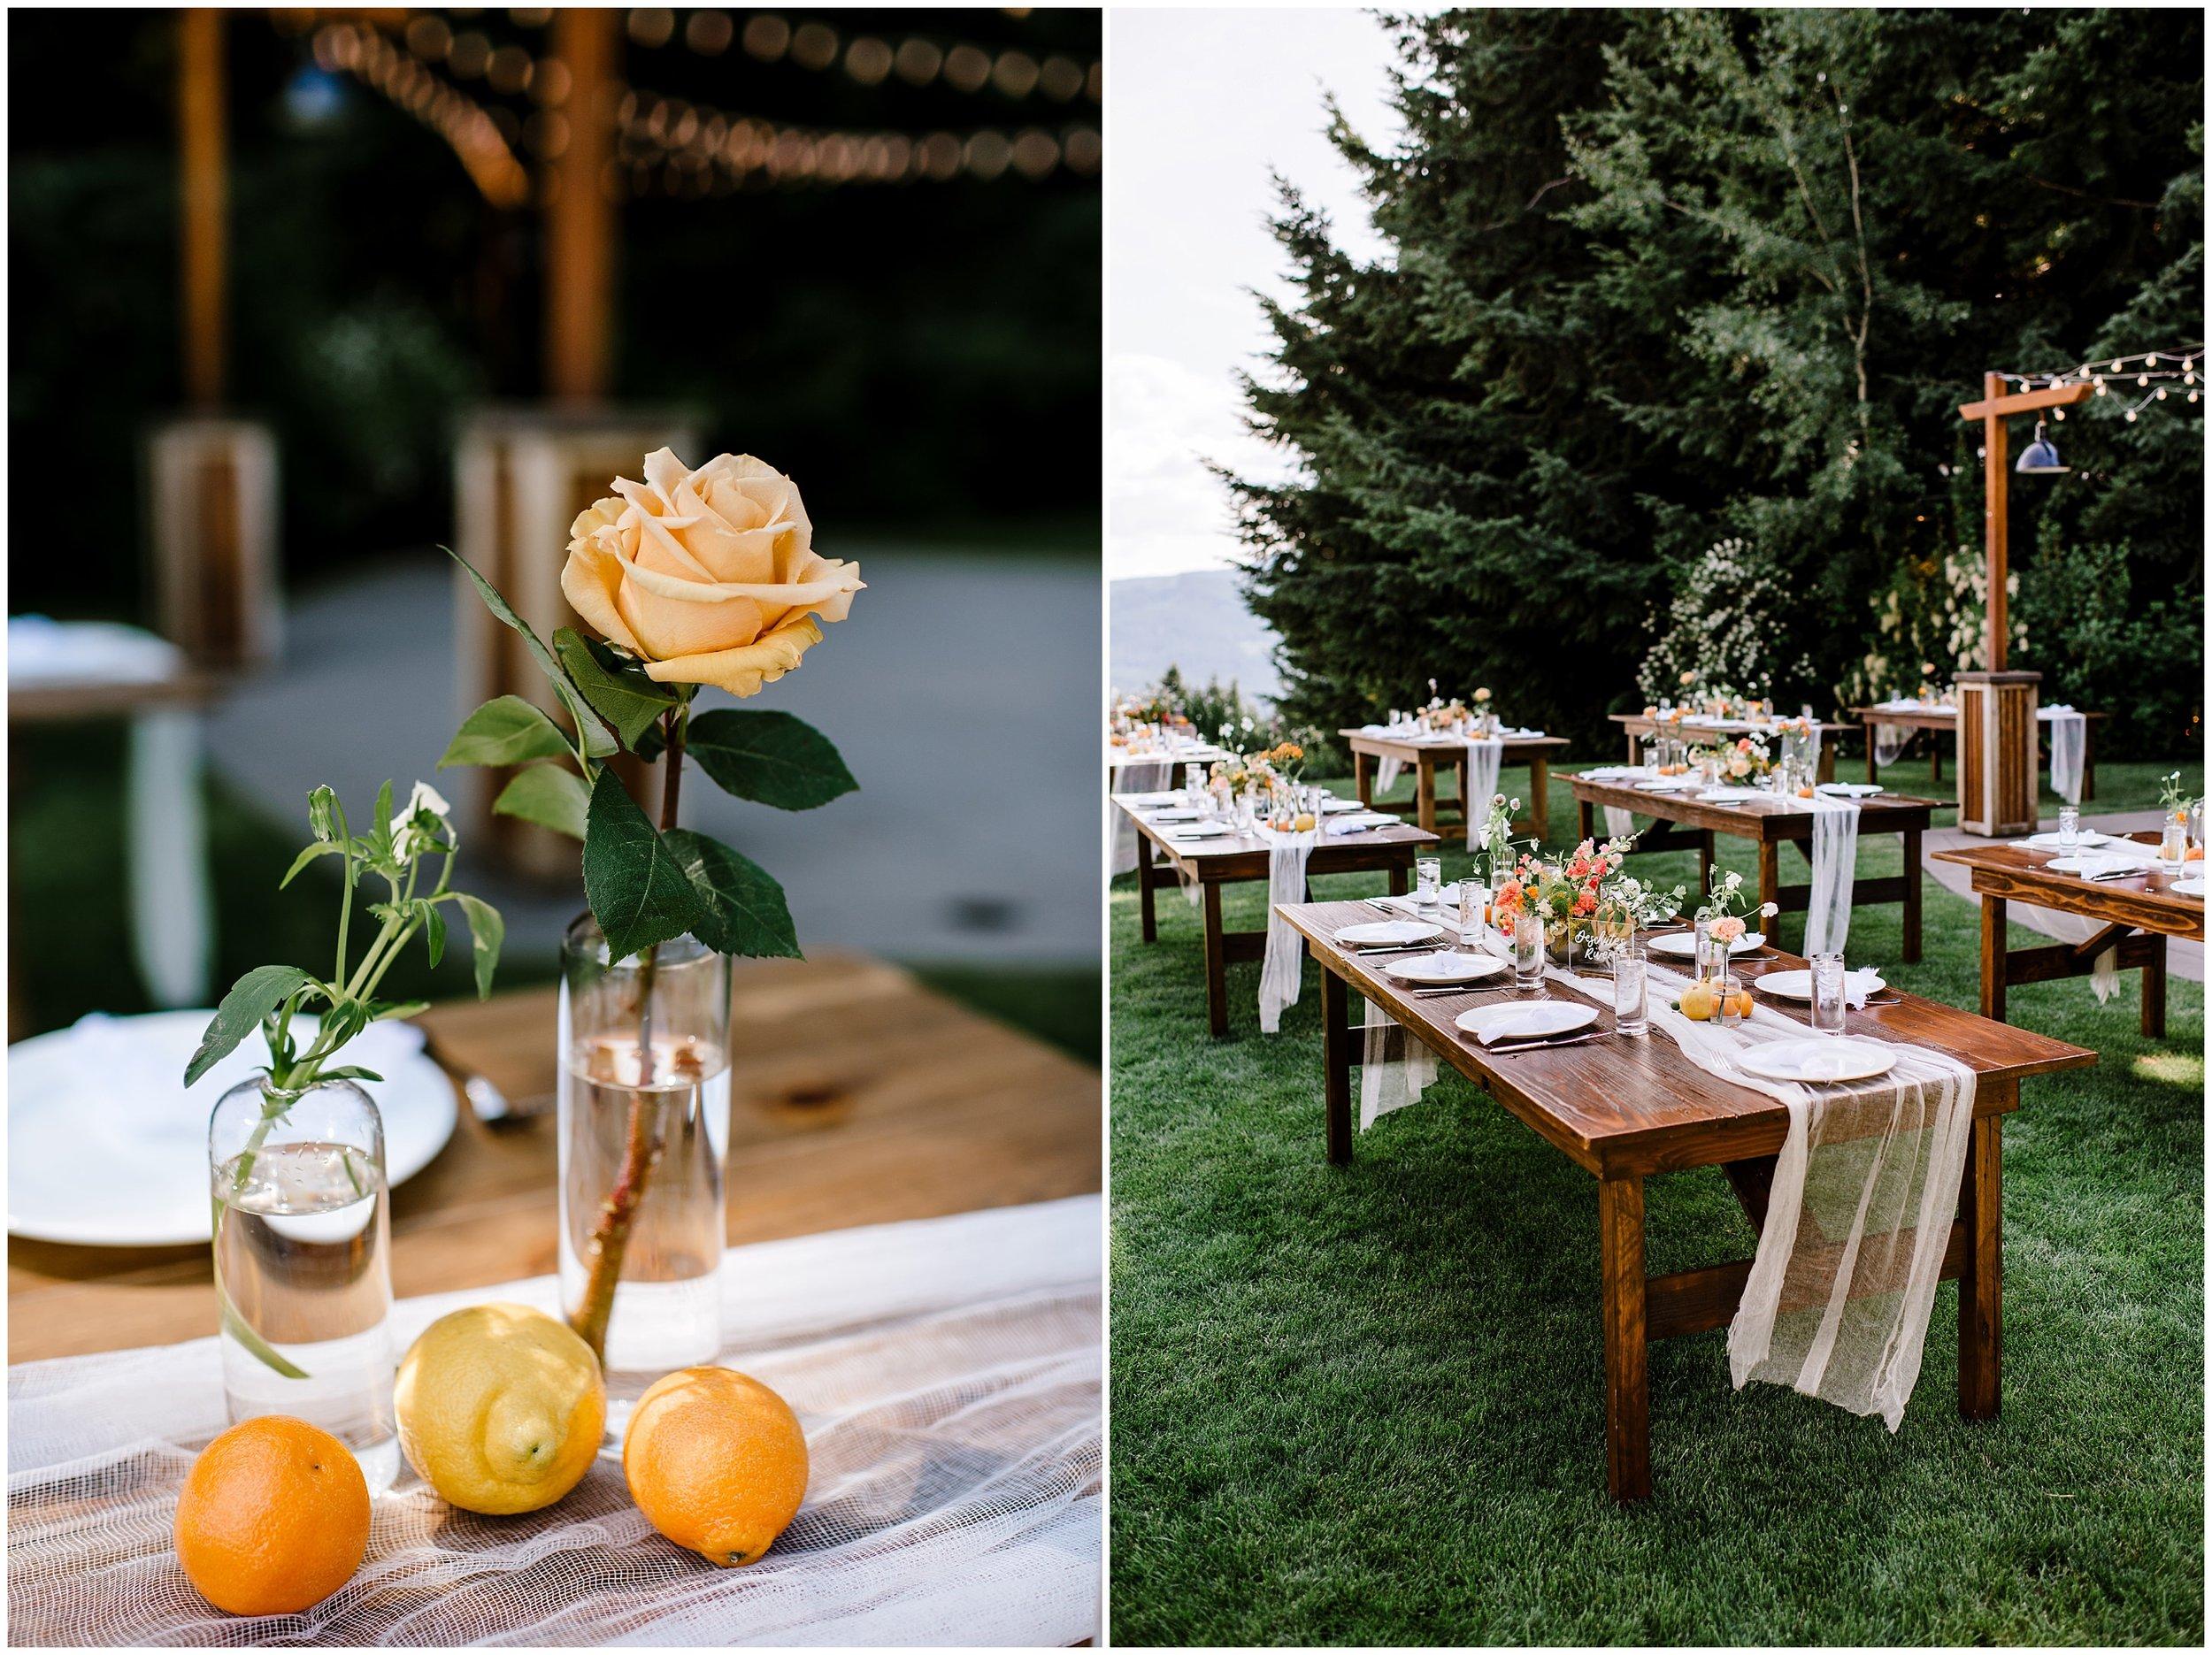 Citrus-inspired-wedding-at-Gorge-Crest-Vineyard-207.jpg